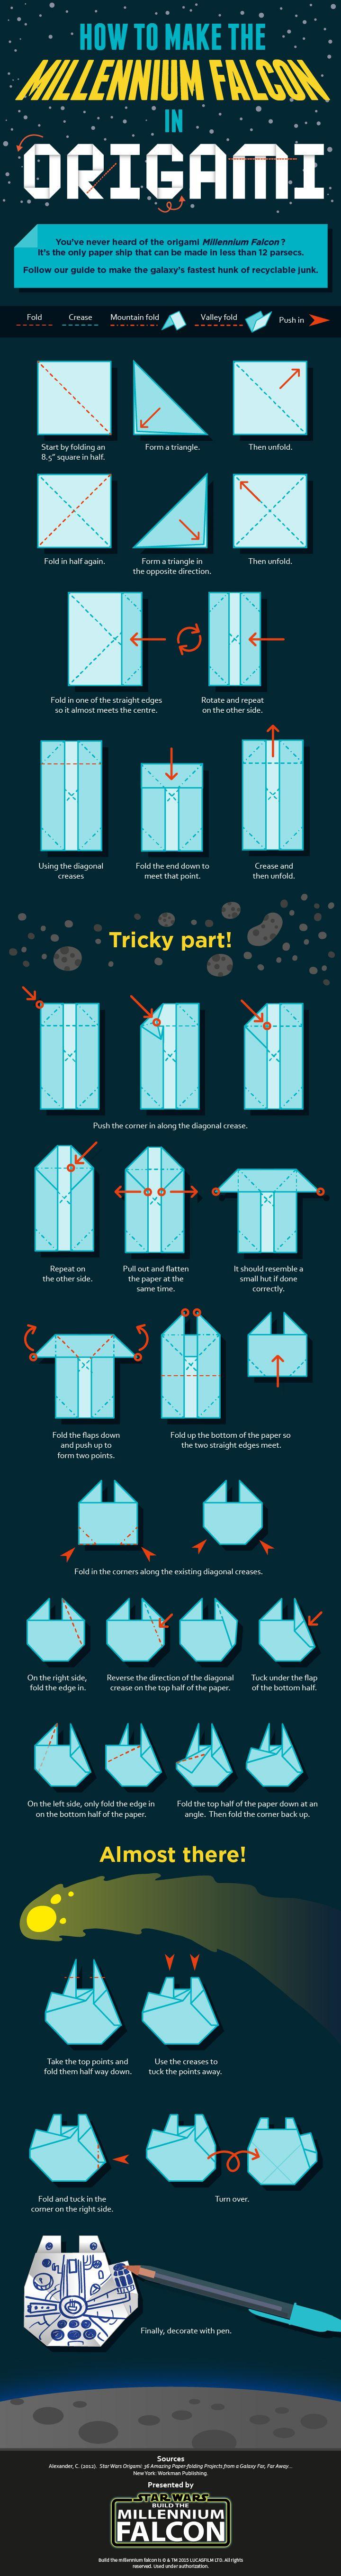 Make A Millennium Falcon In Origami Creative Ideasprojects